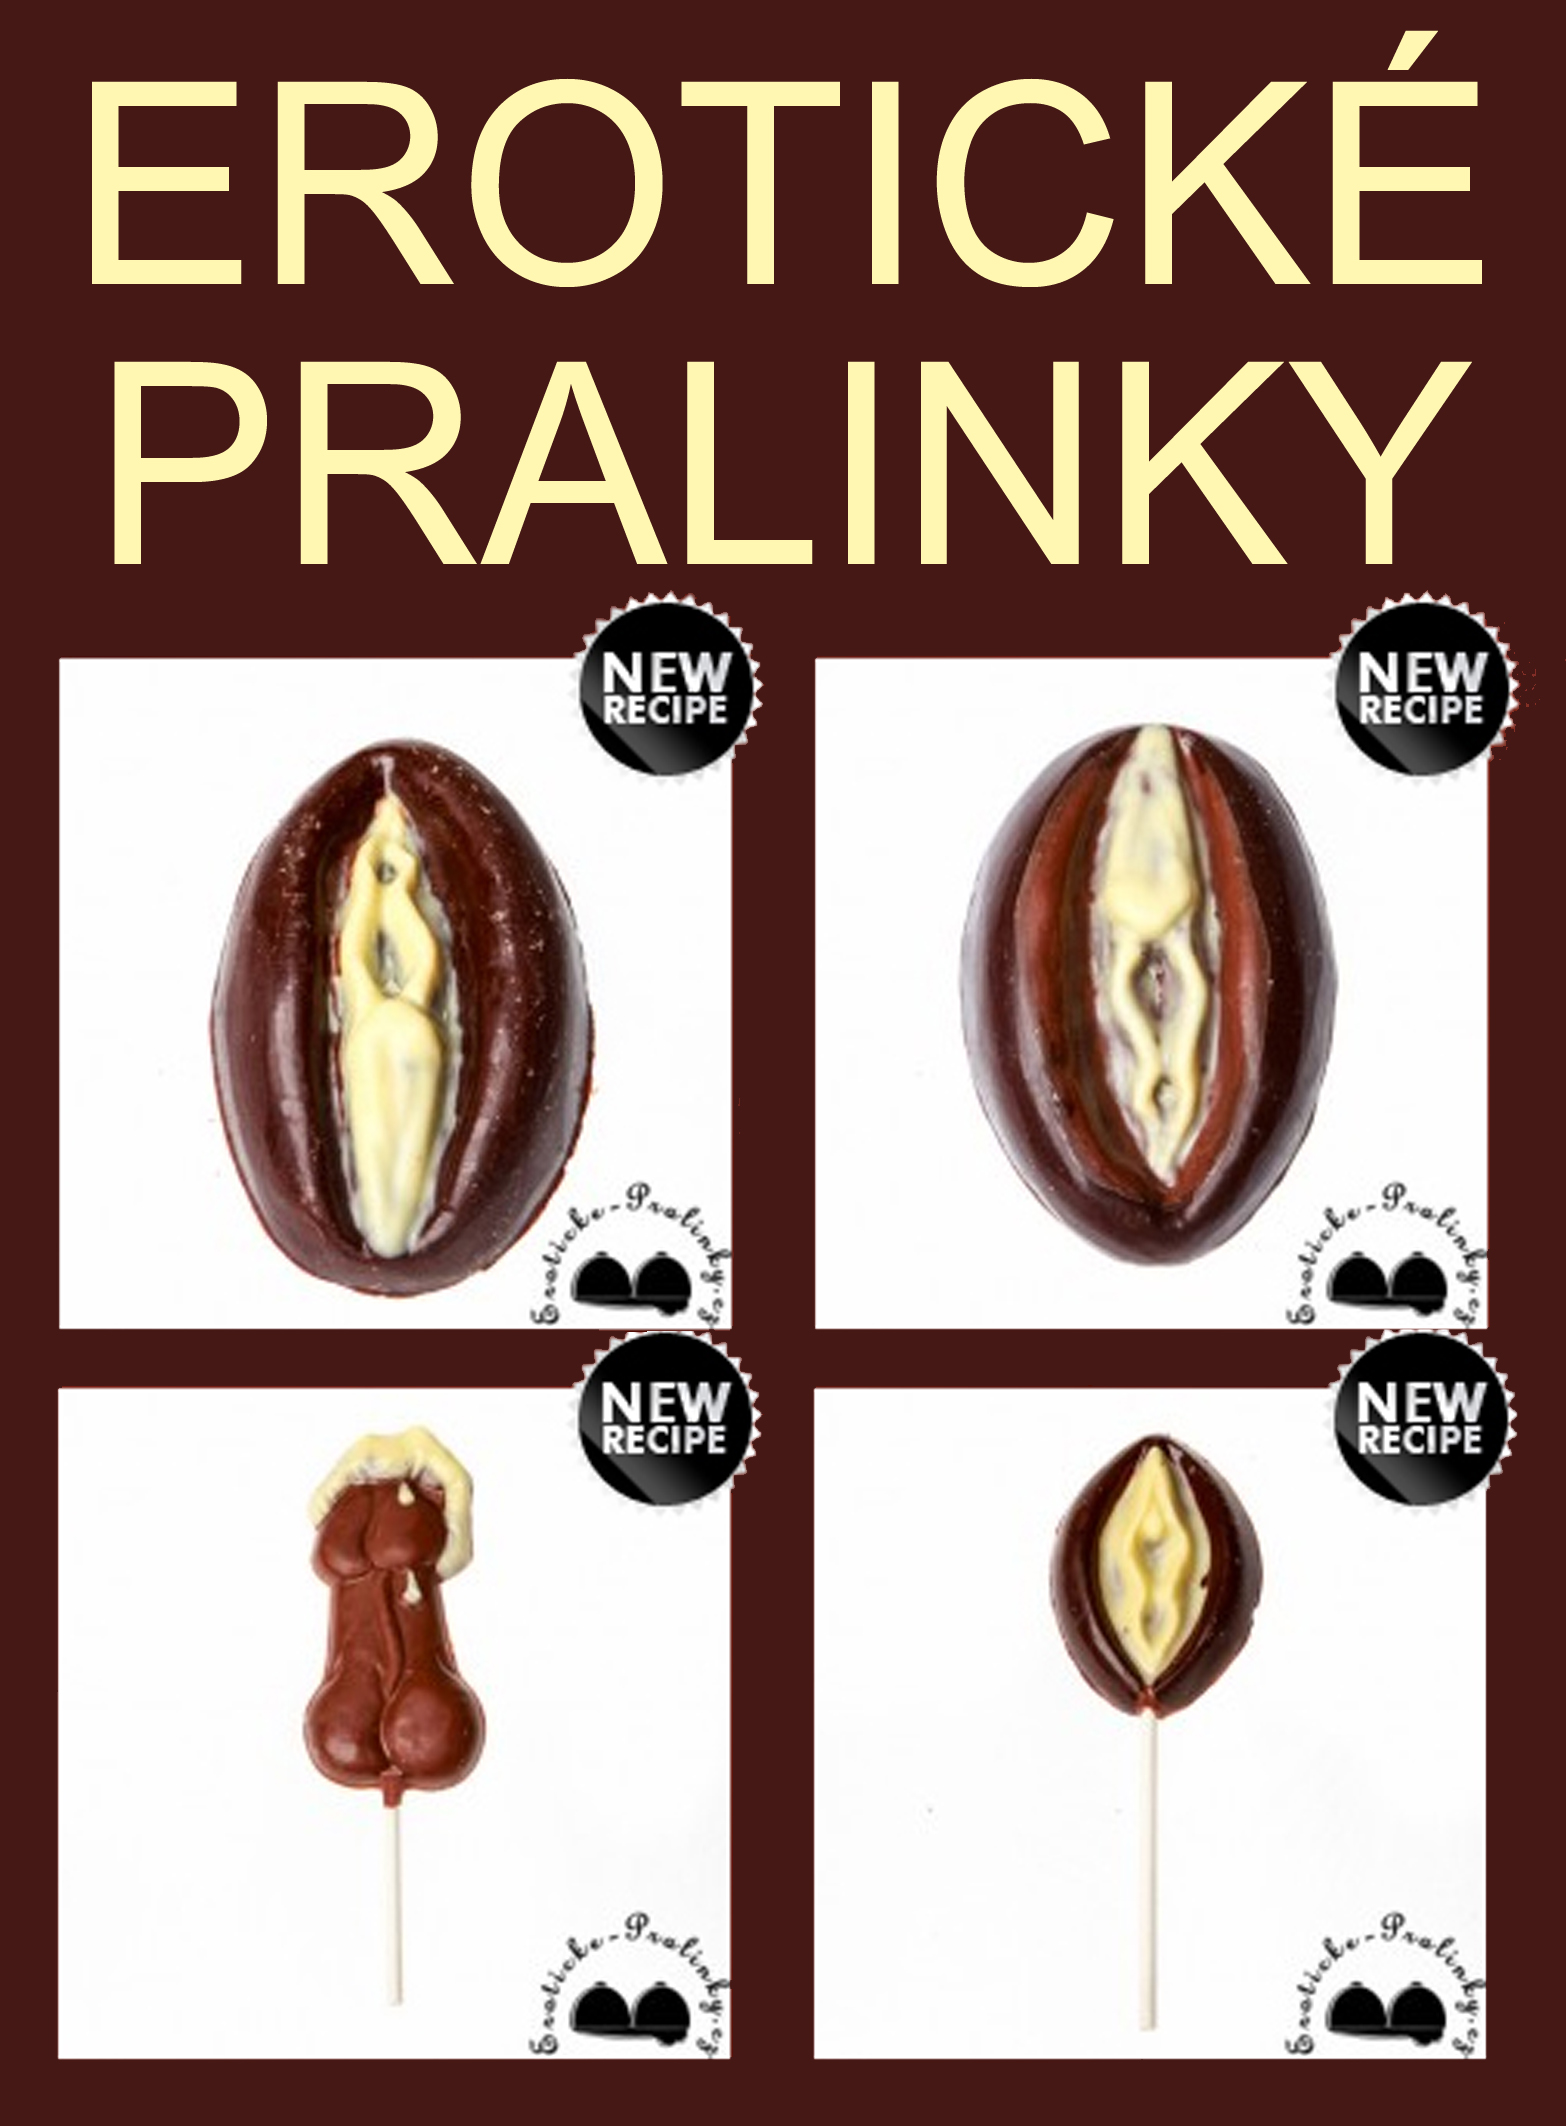 Erotick-pralinky